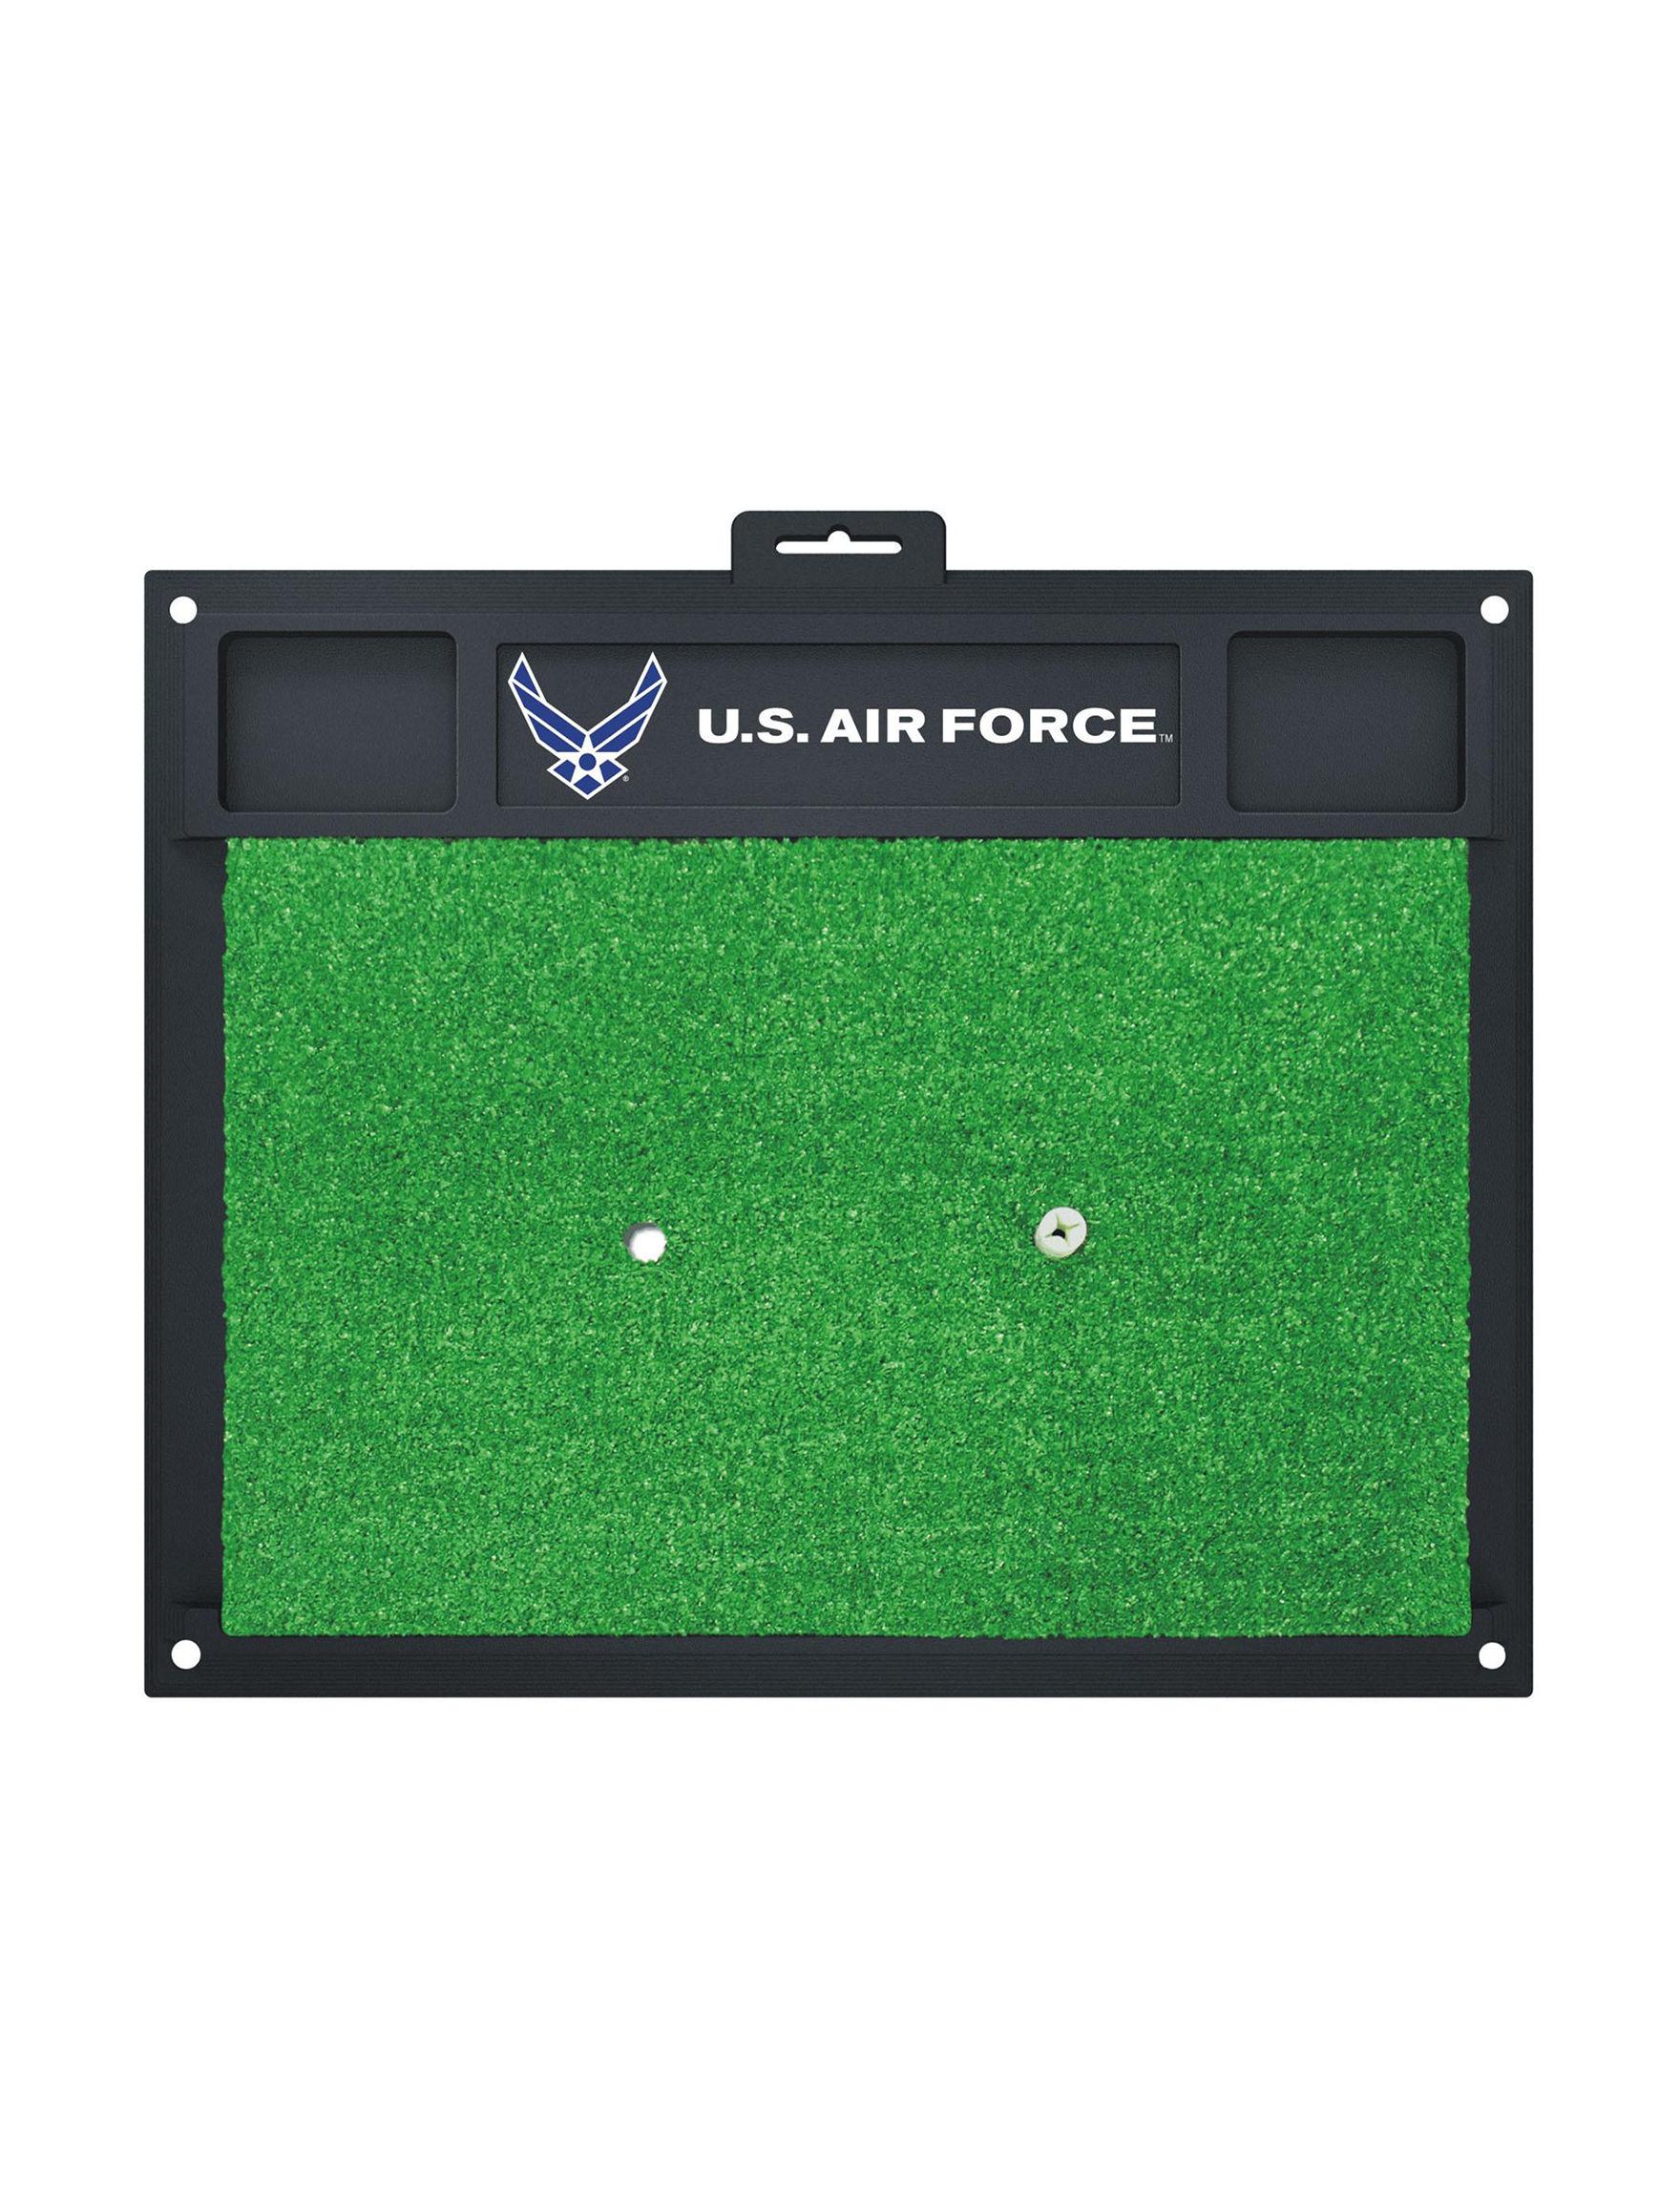 Fanmats Blue / White Outdoor Rugs & Doormats Outdoor Decor